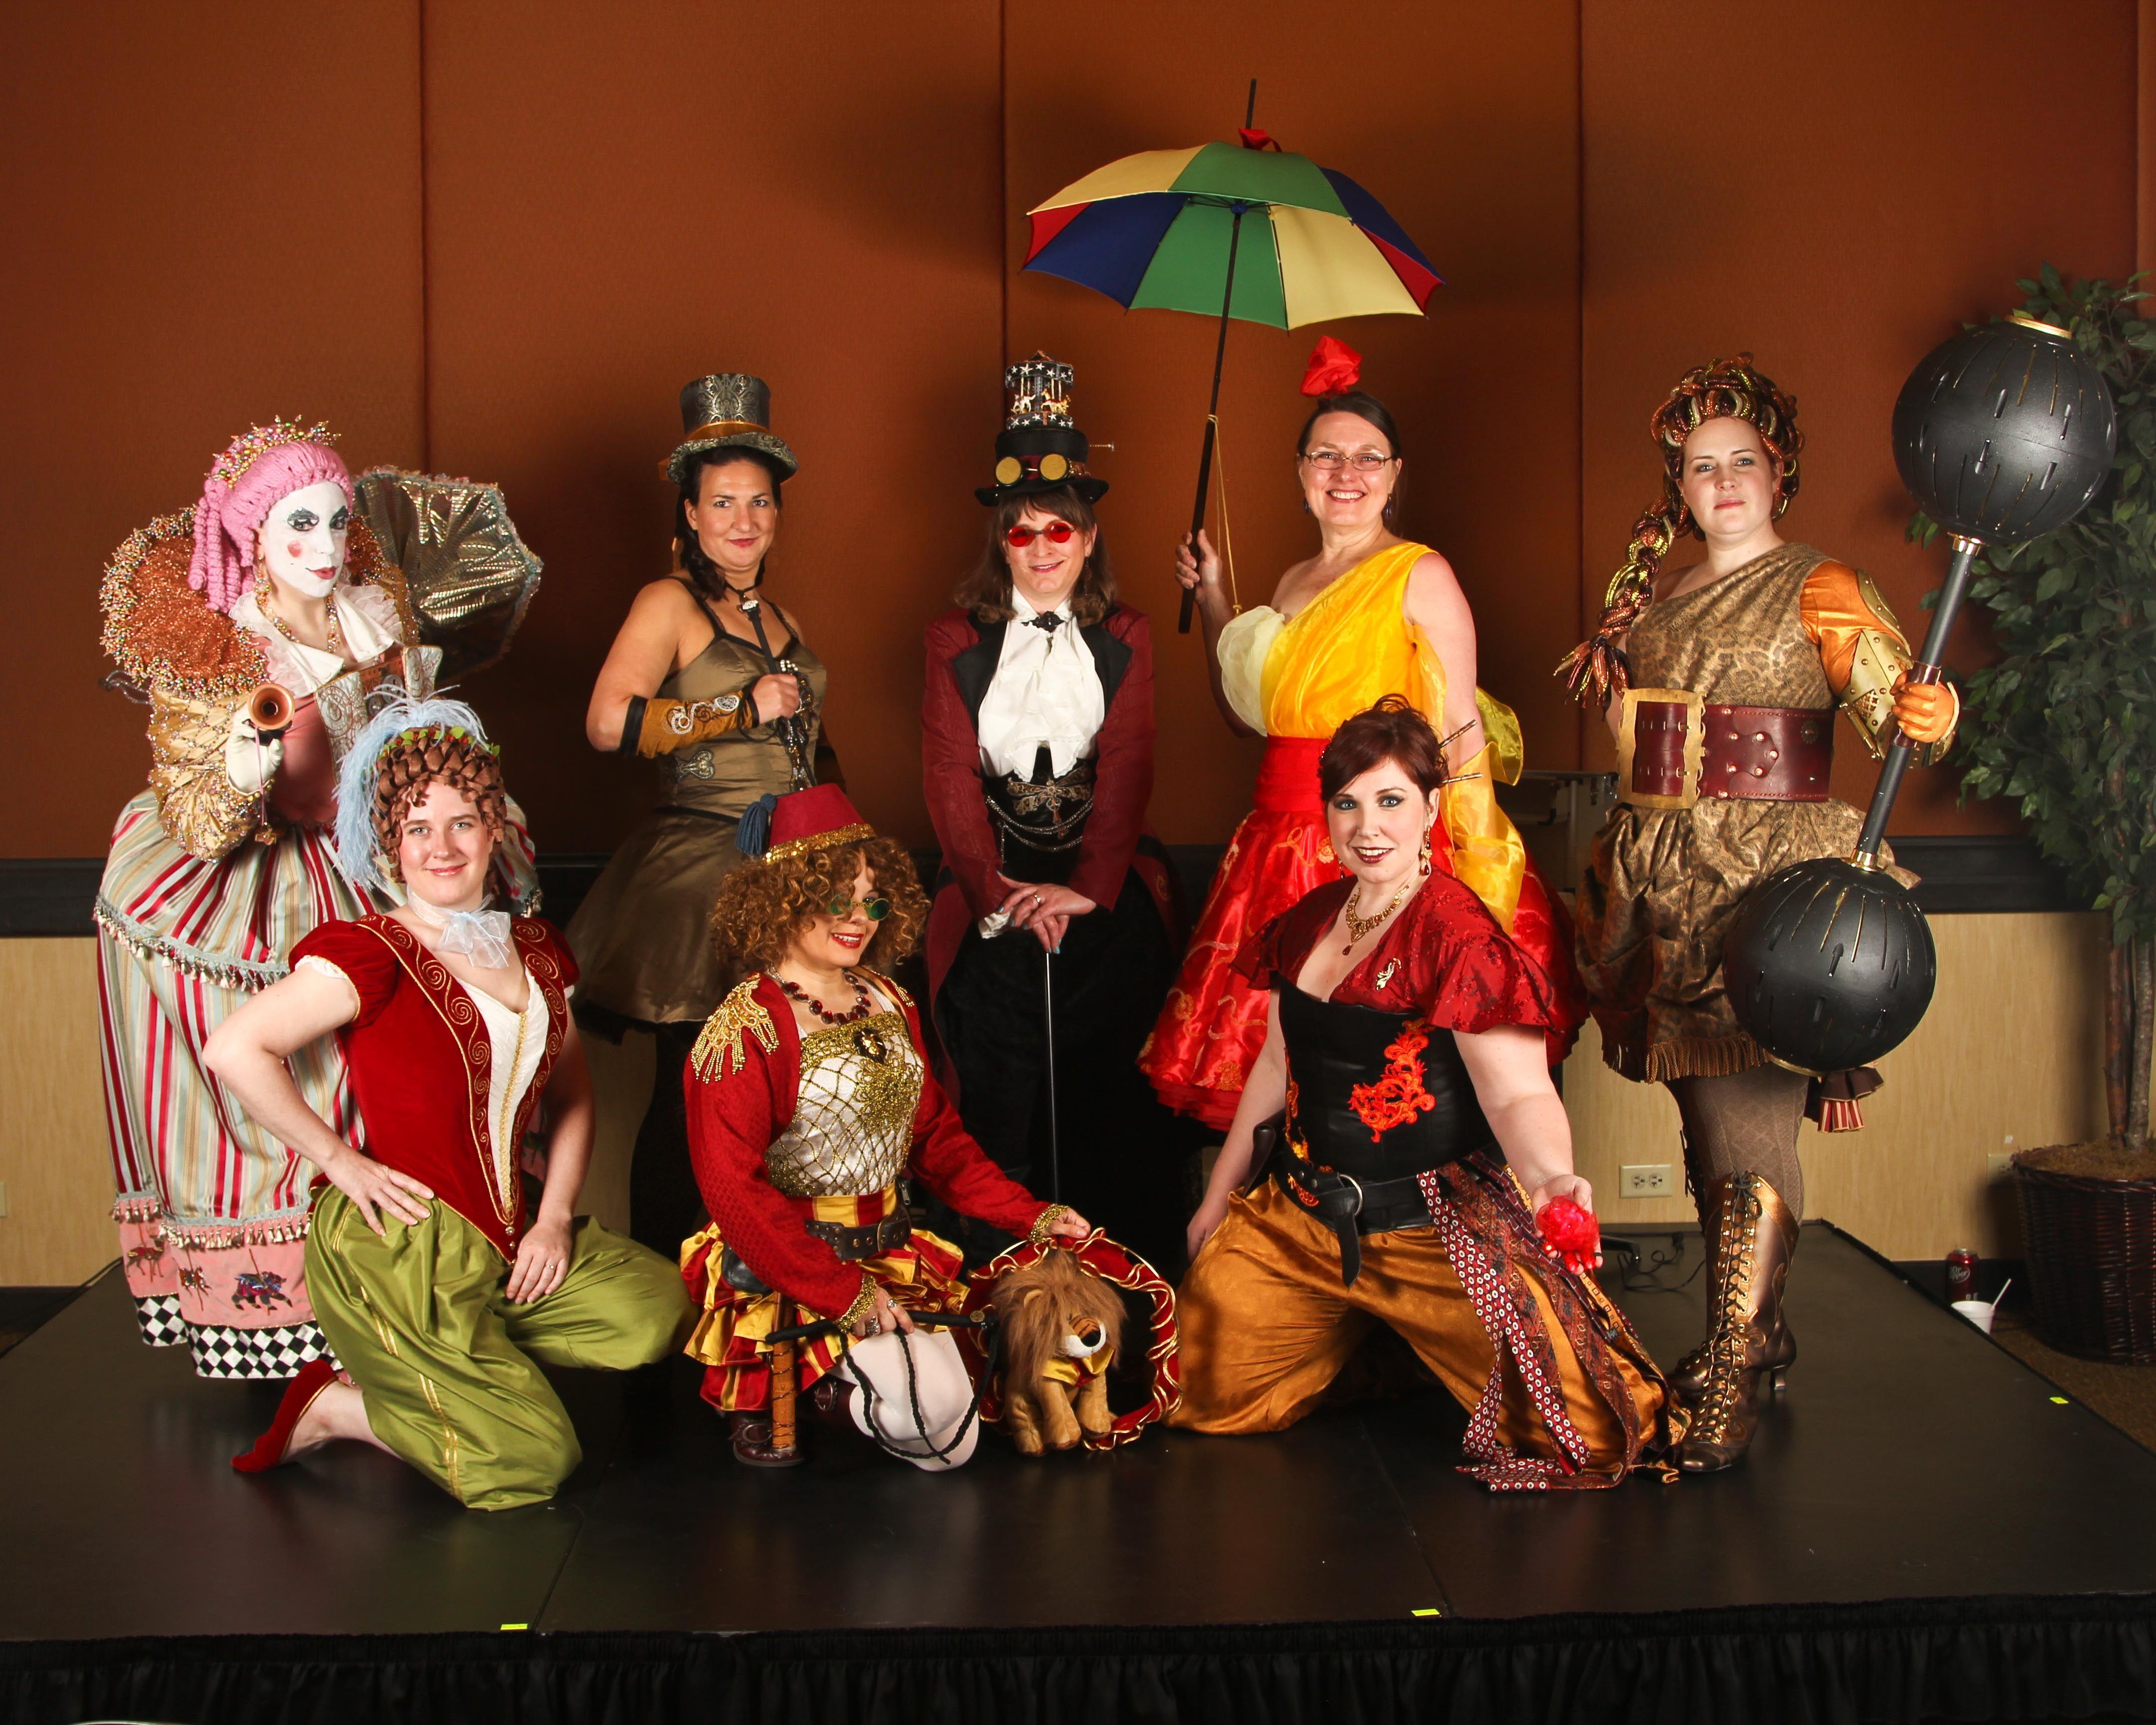 circus costume ideas - Google Search | Halloween Inspiration ...